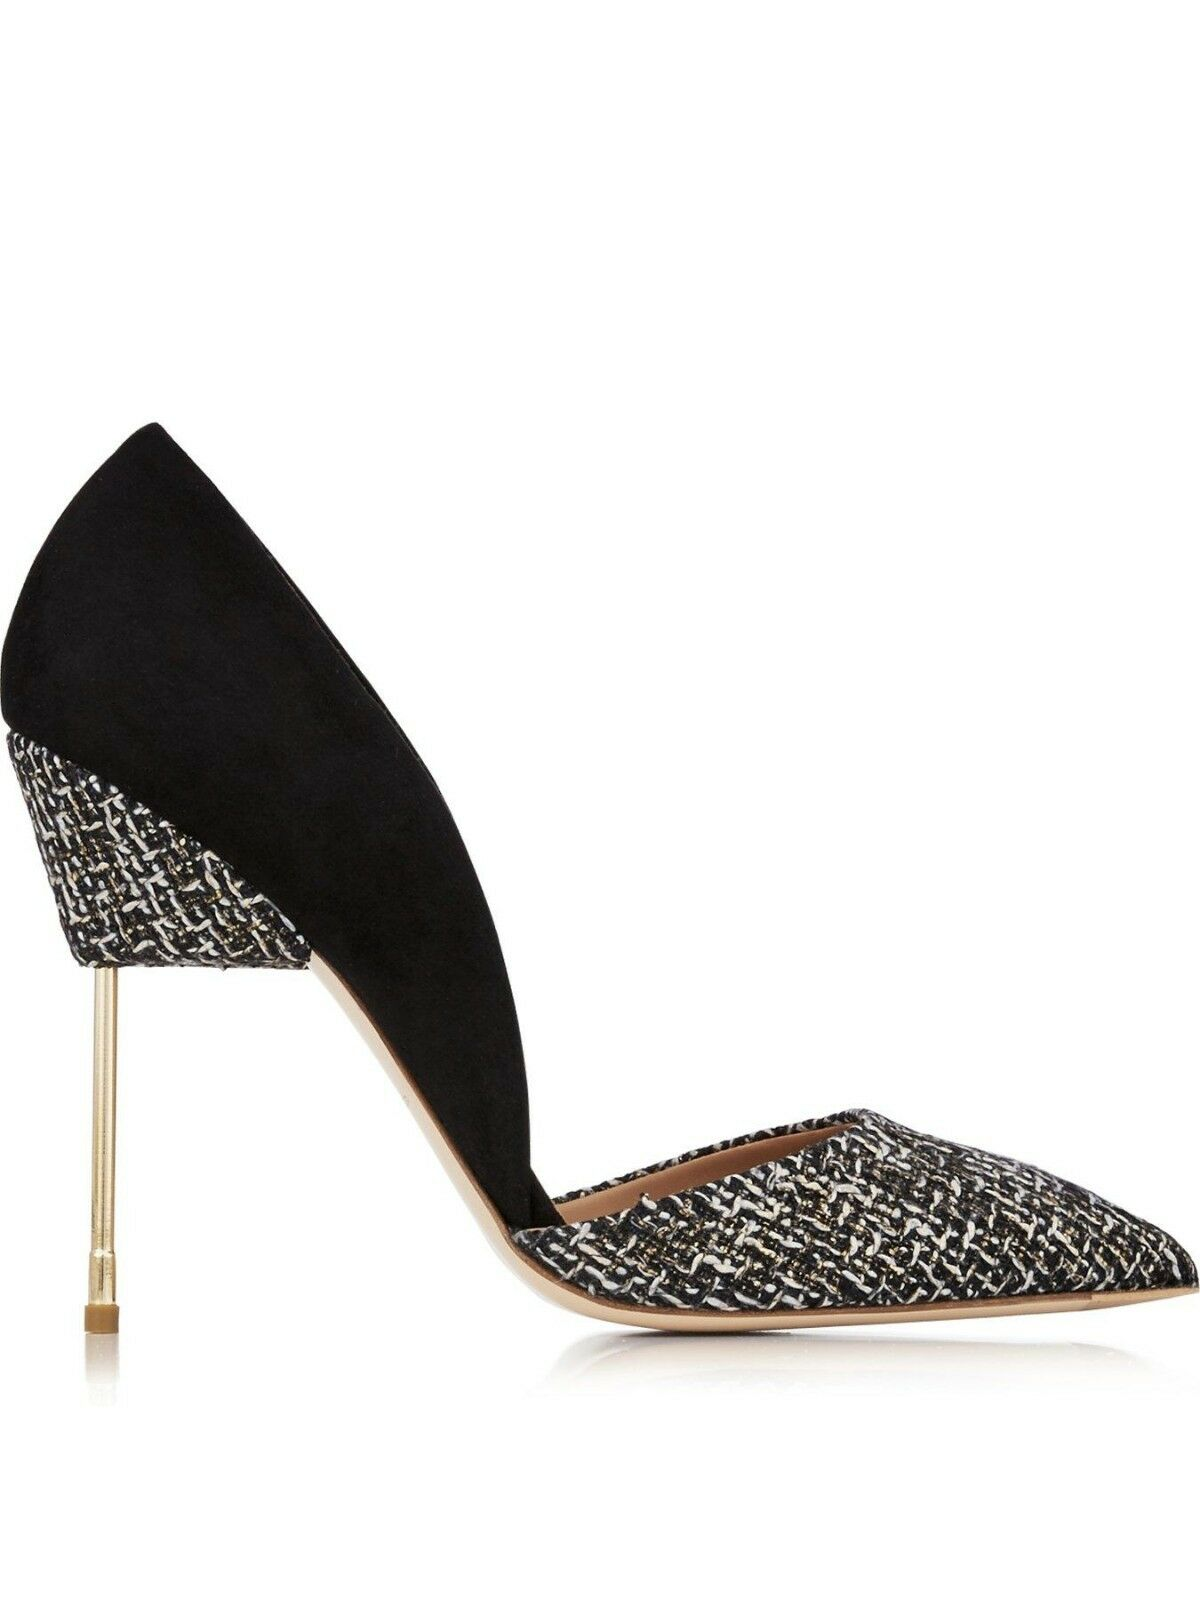 Kurt Geiger Bond Black & Gold Tweed High Heel Court Court Heel Shoes Size 5 EU 38 BNIB 230 636ad1